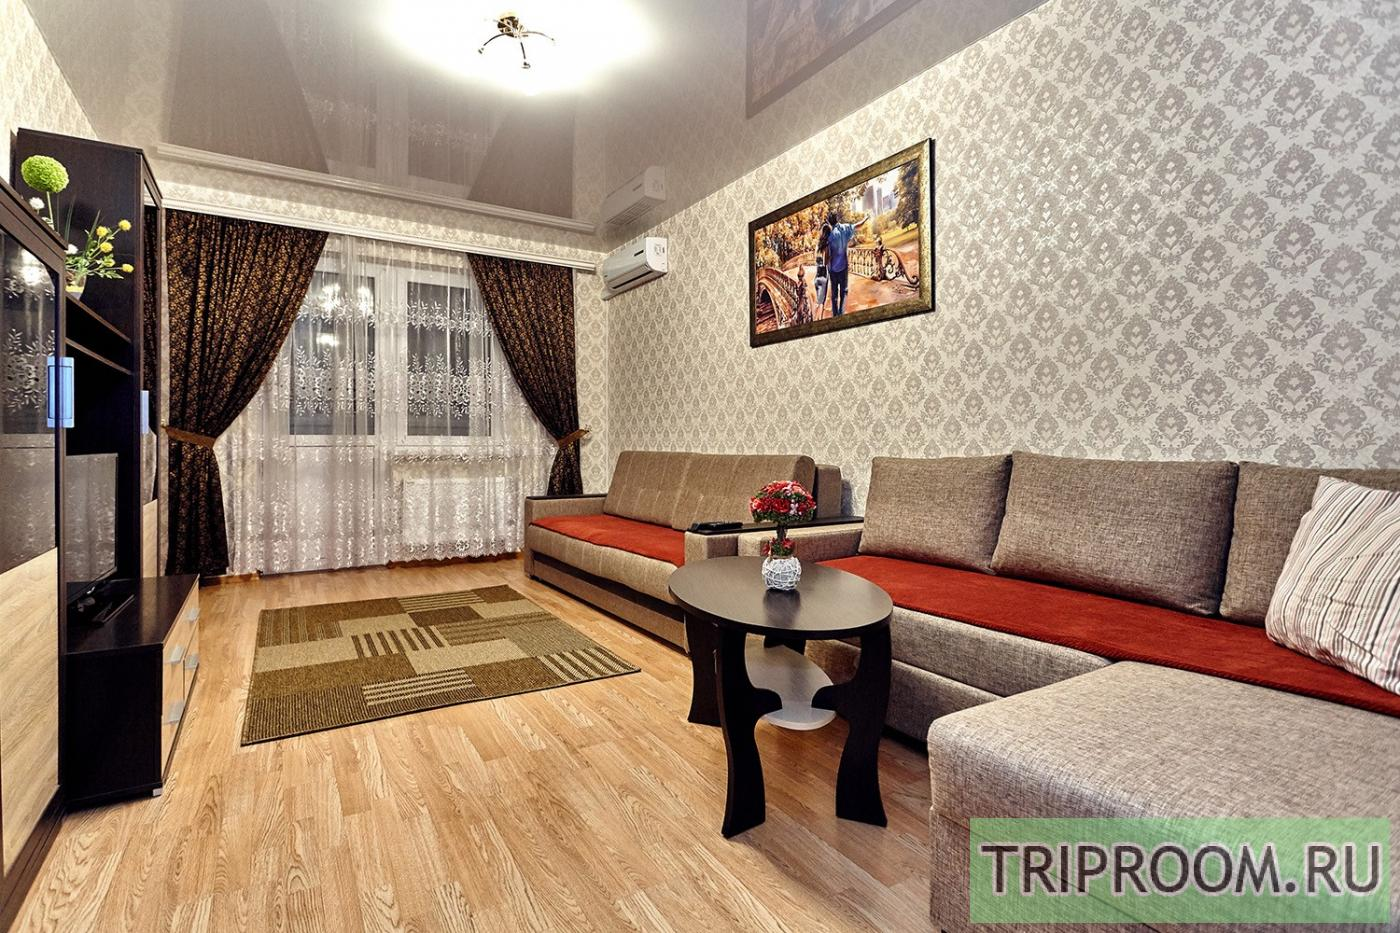 2-комнатная квартира посуточно (вариант № 10581), ул. Соколова улица, фото № 4